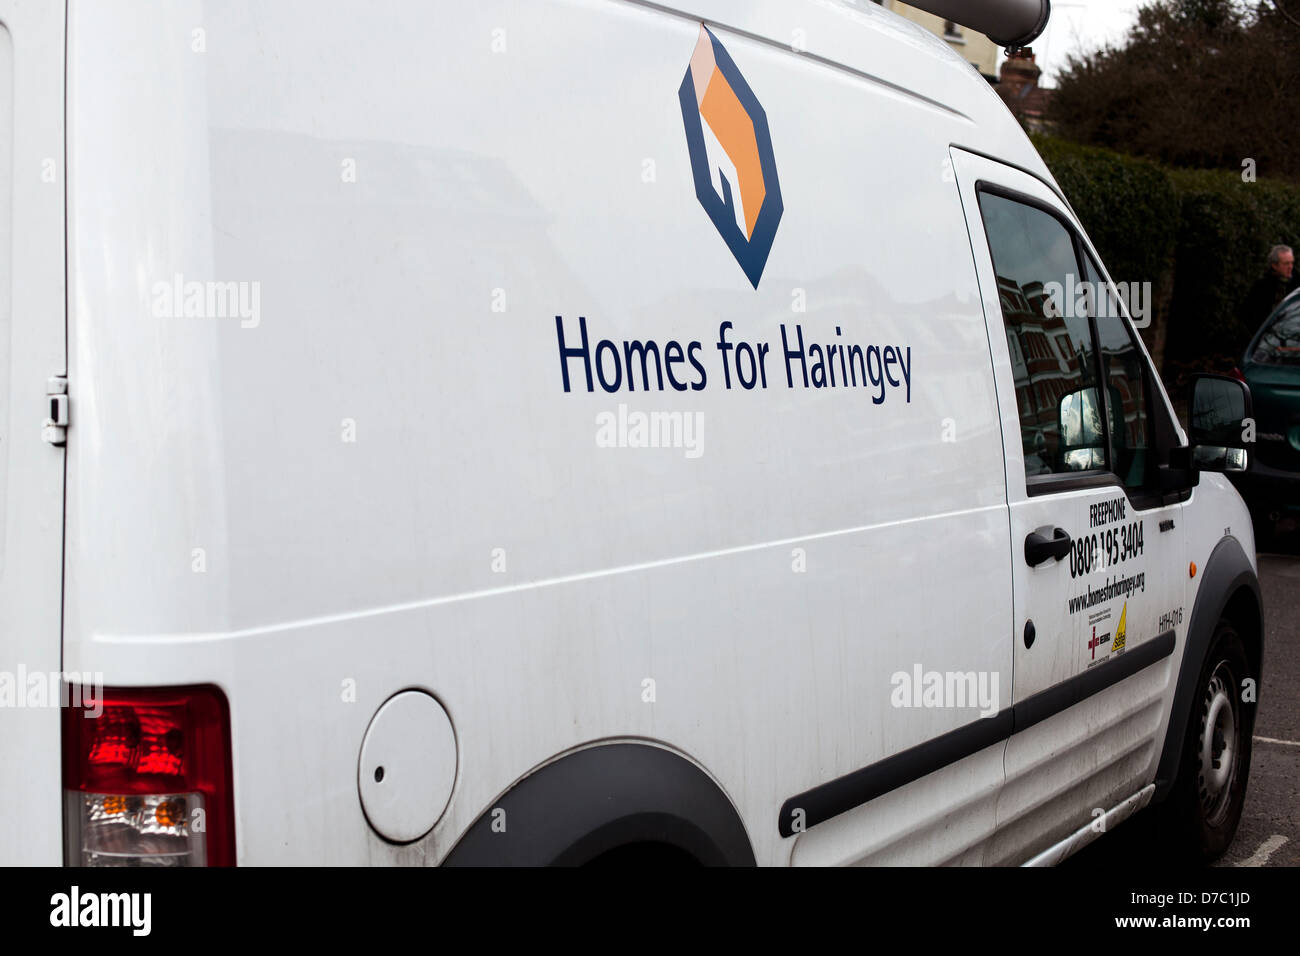 Haringey Council van - Stock Image